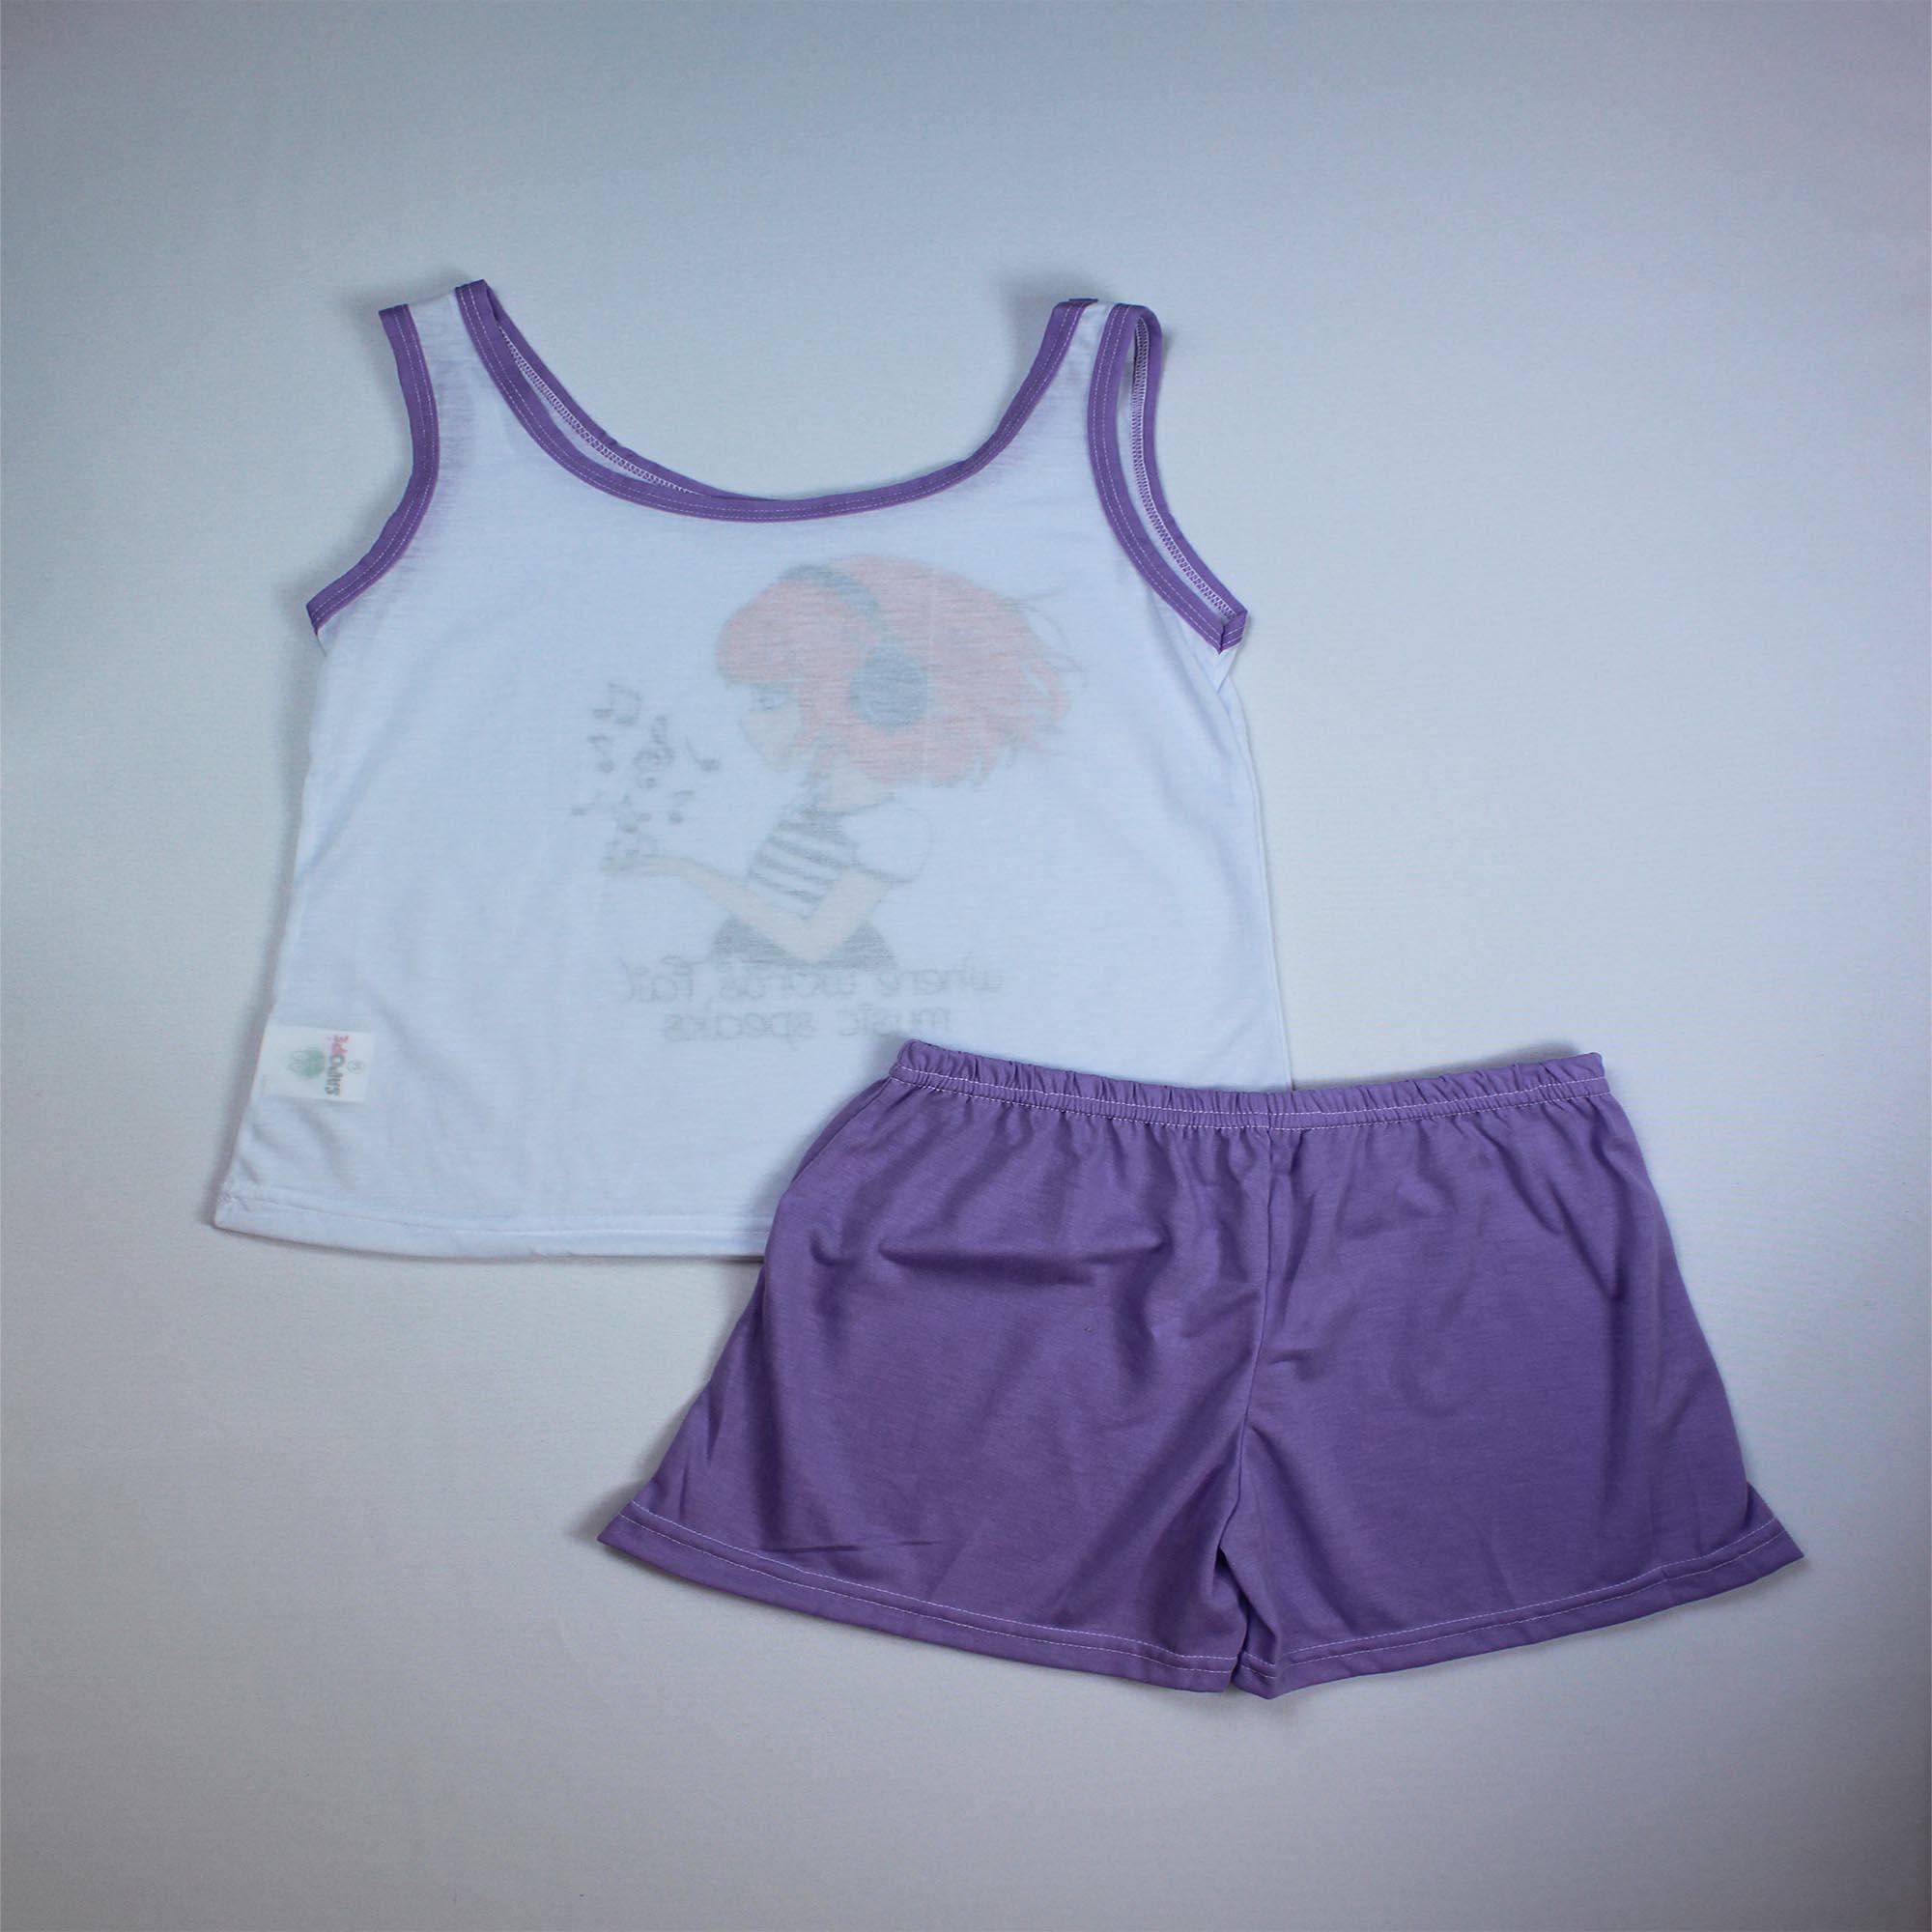 Pijama Regata Infantil Menina - Tamanho 14